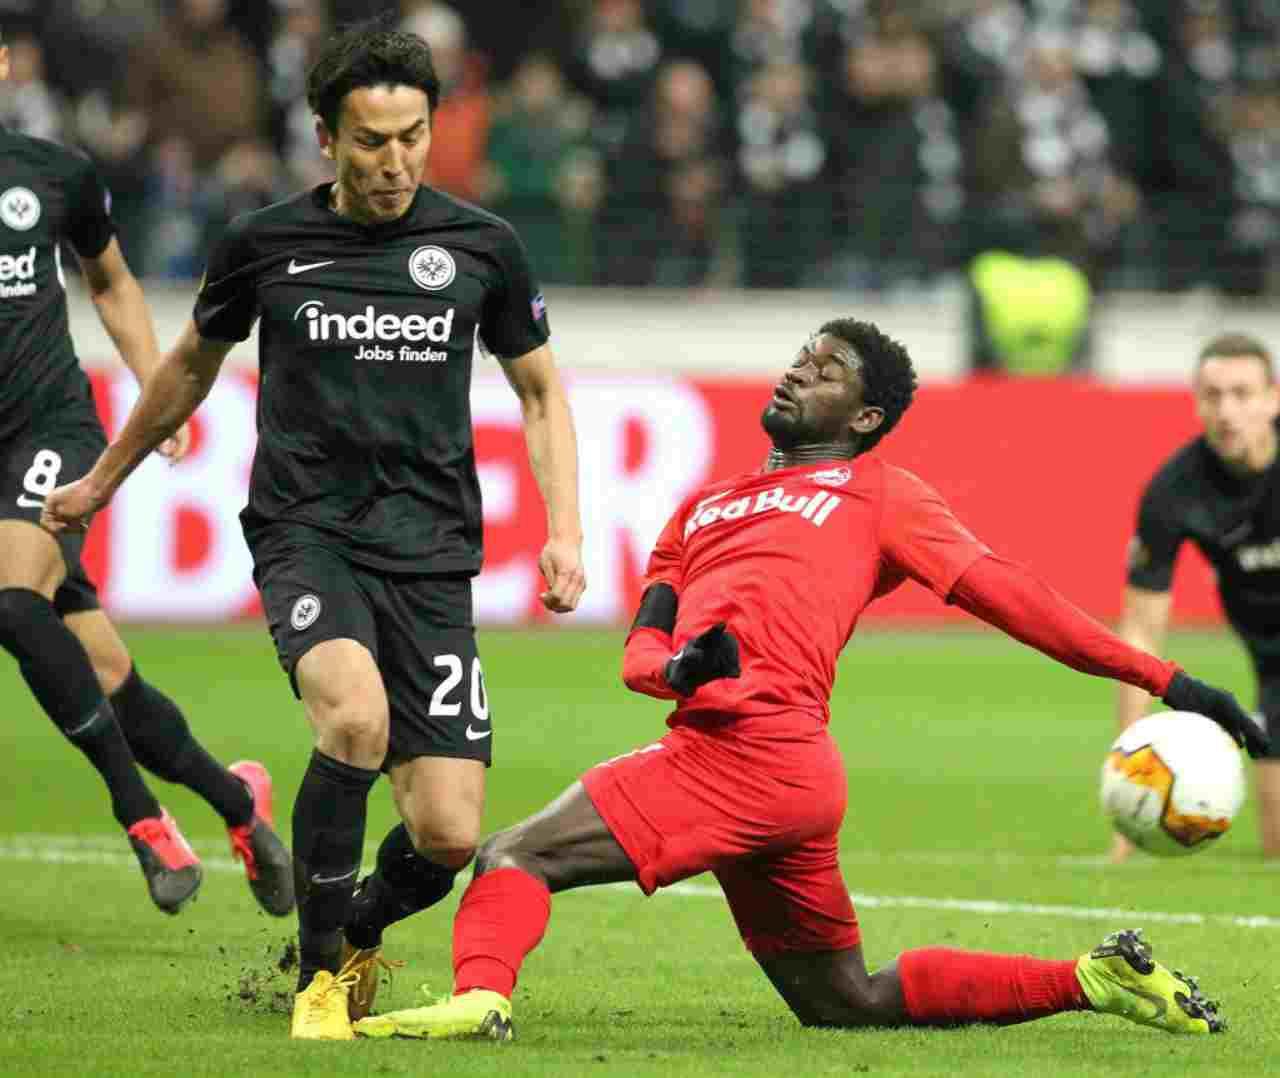 Europa League, Salisburgo-Eintracht Francoforte rinviata: stavolta il coronavirus non c'entra